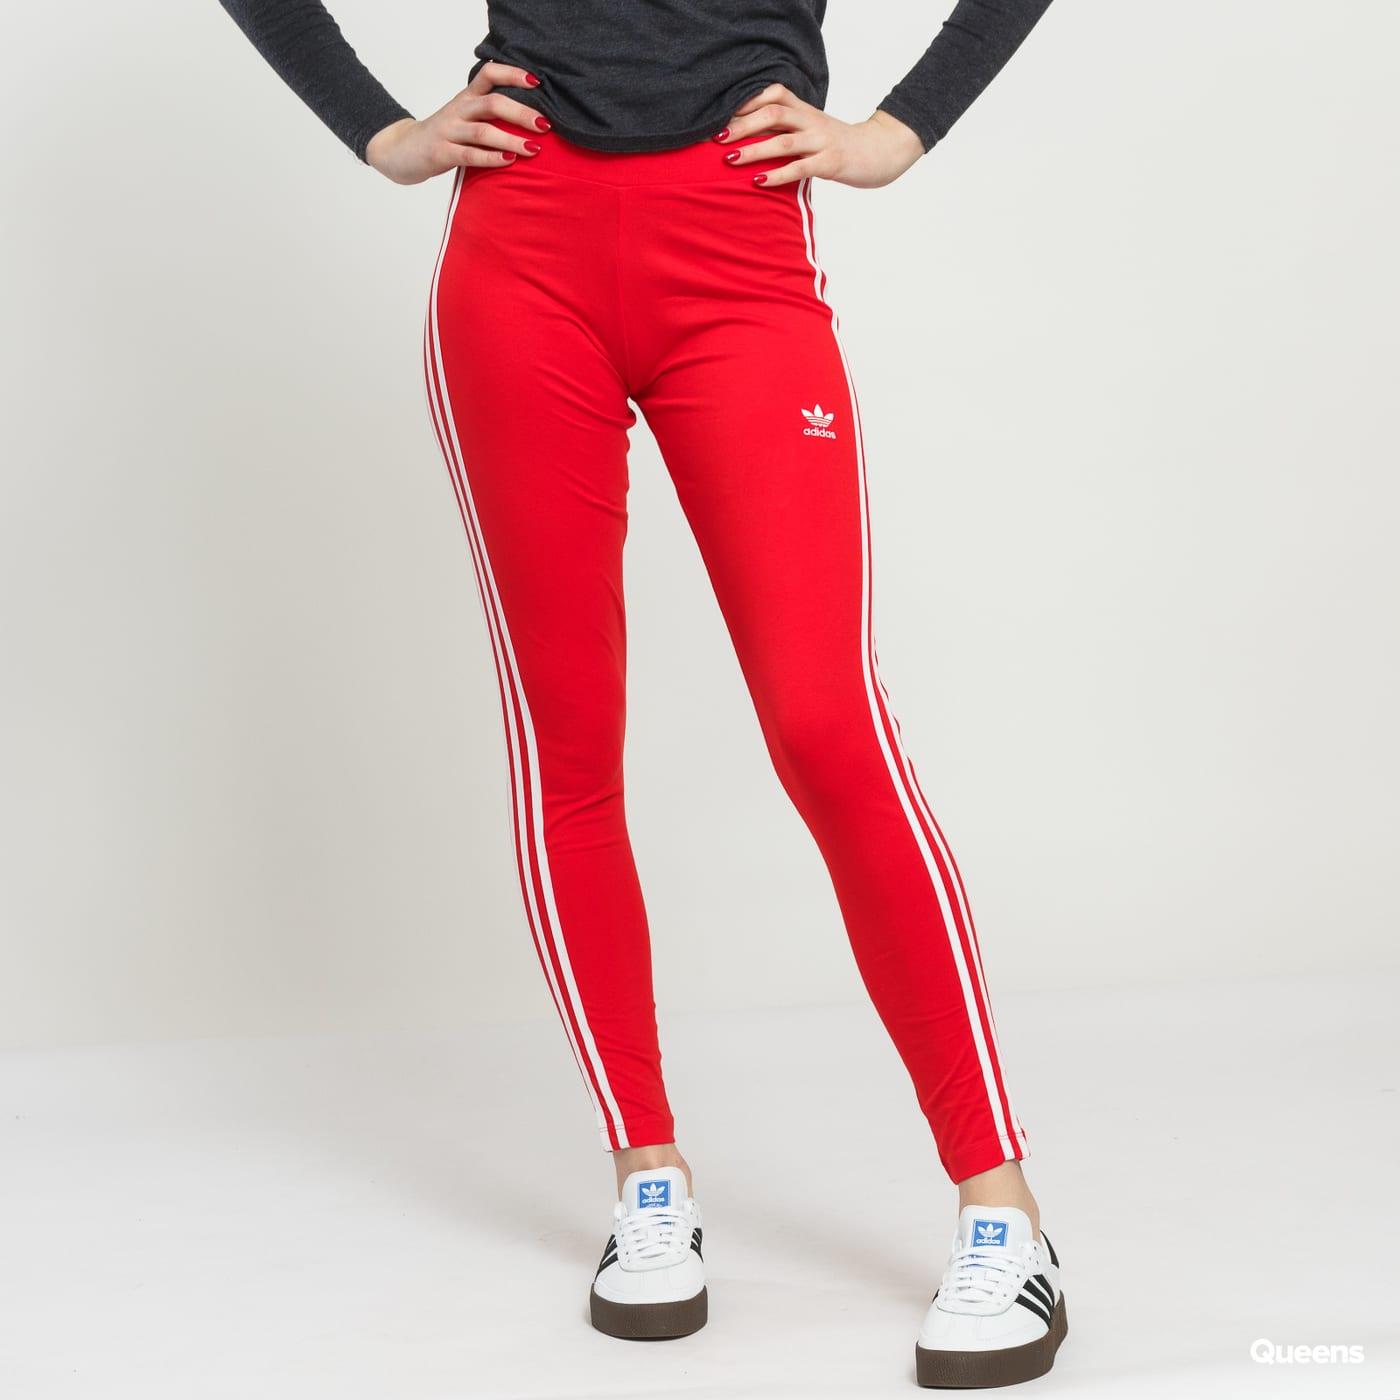 Dámské legíny adidas Originals 5610b4f34dc